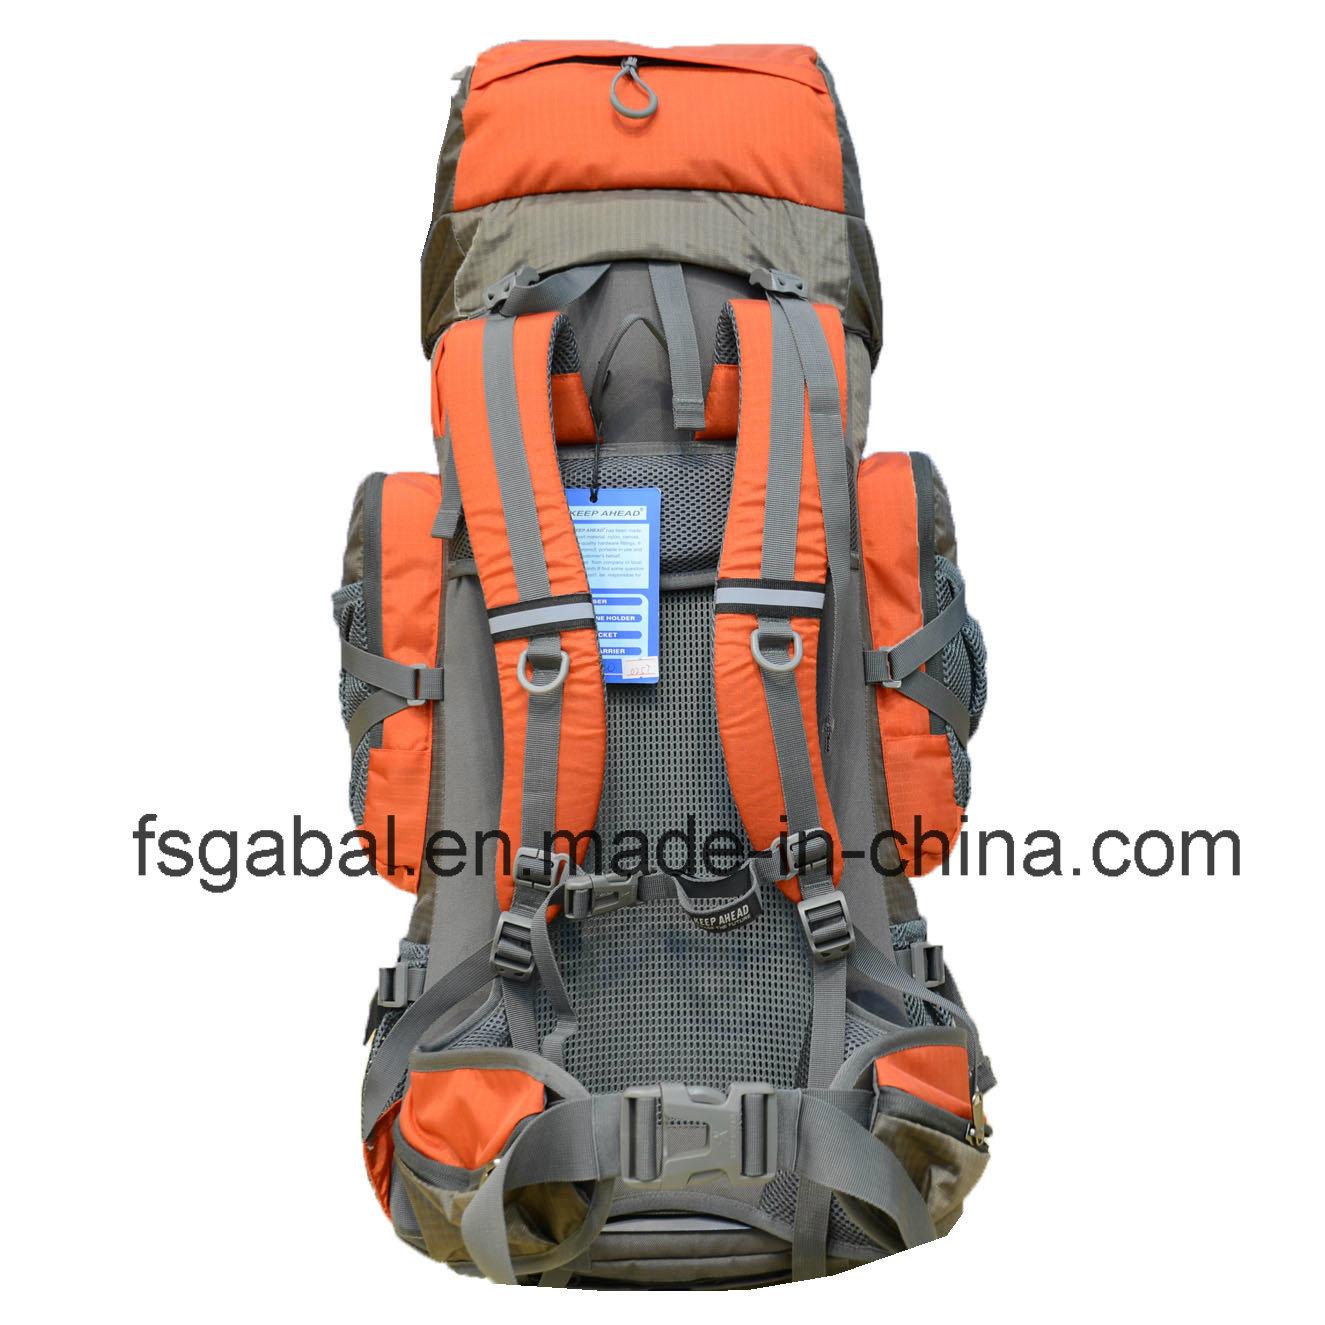 Outdoor Waterproof Sporting Backpacks Rucksack for Sports Travel Hiking Camping